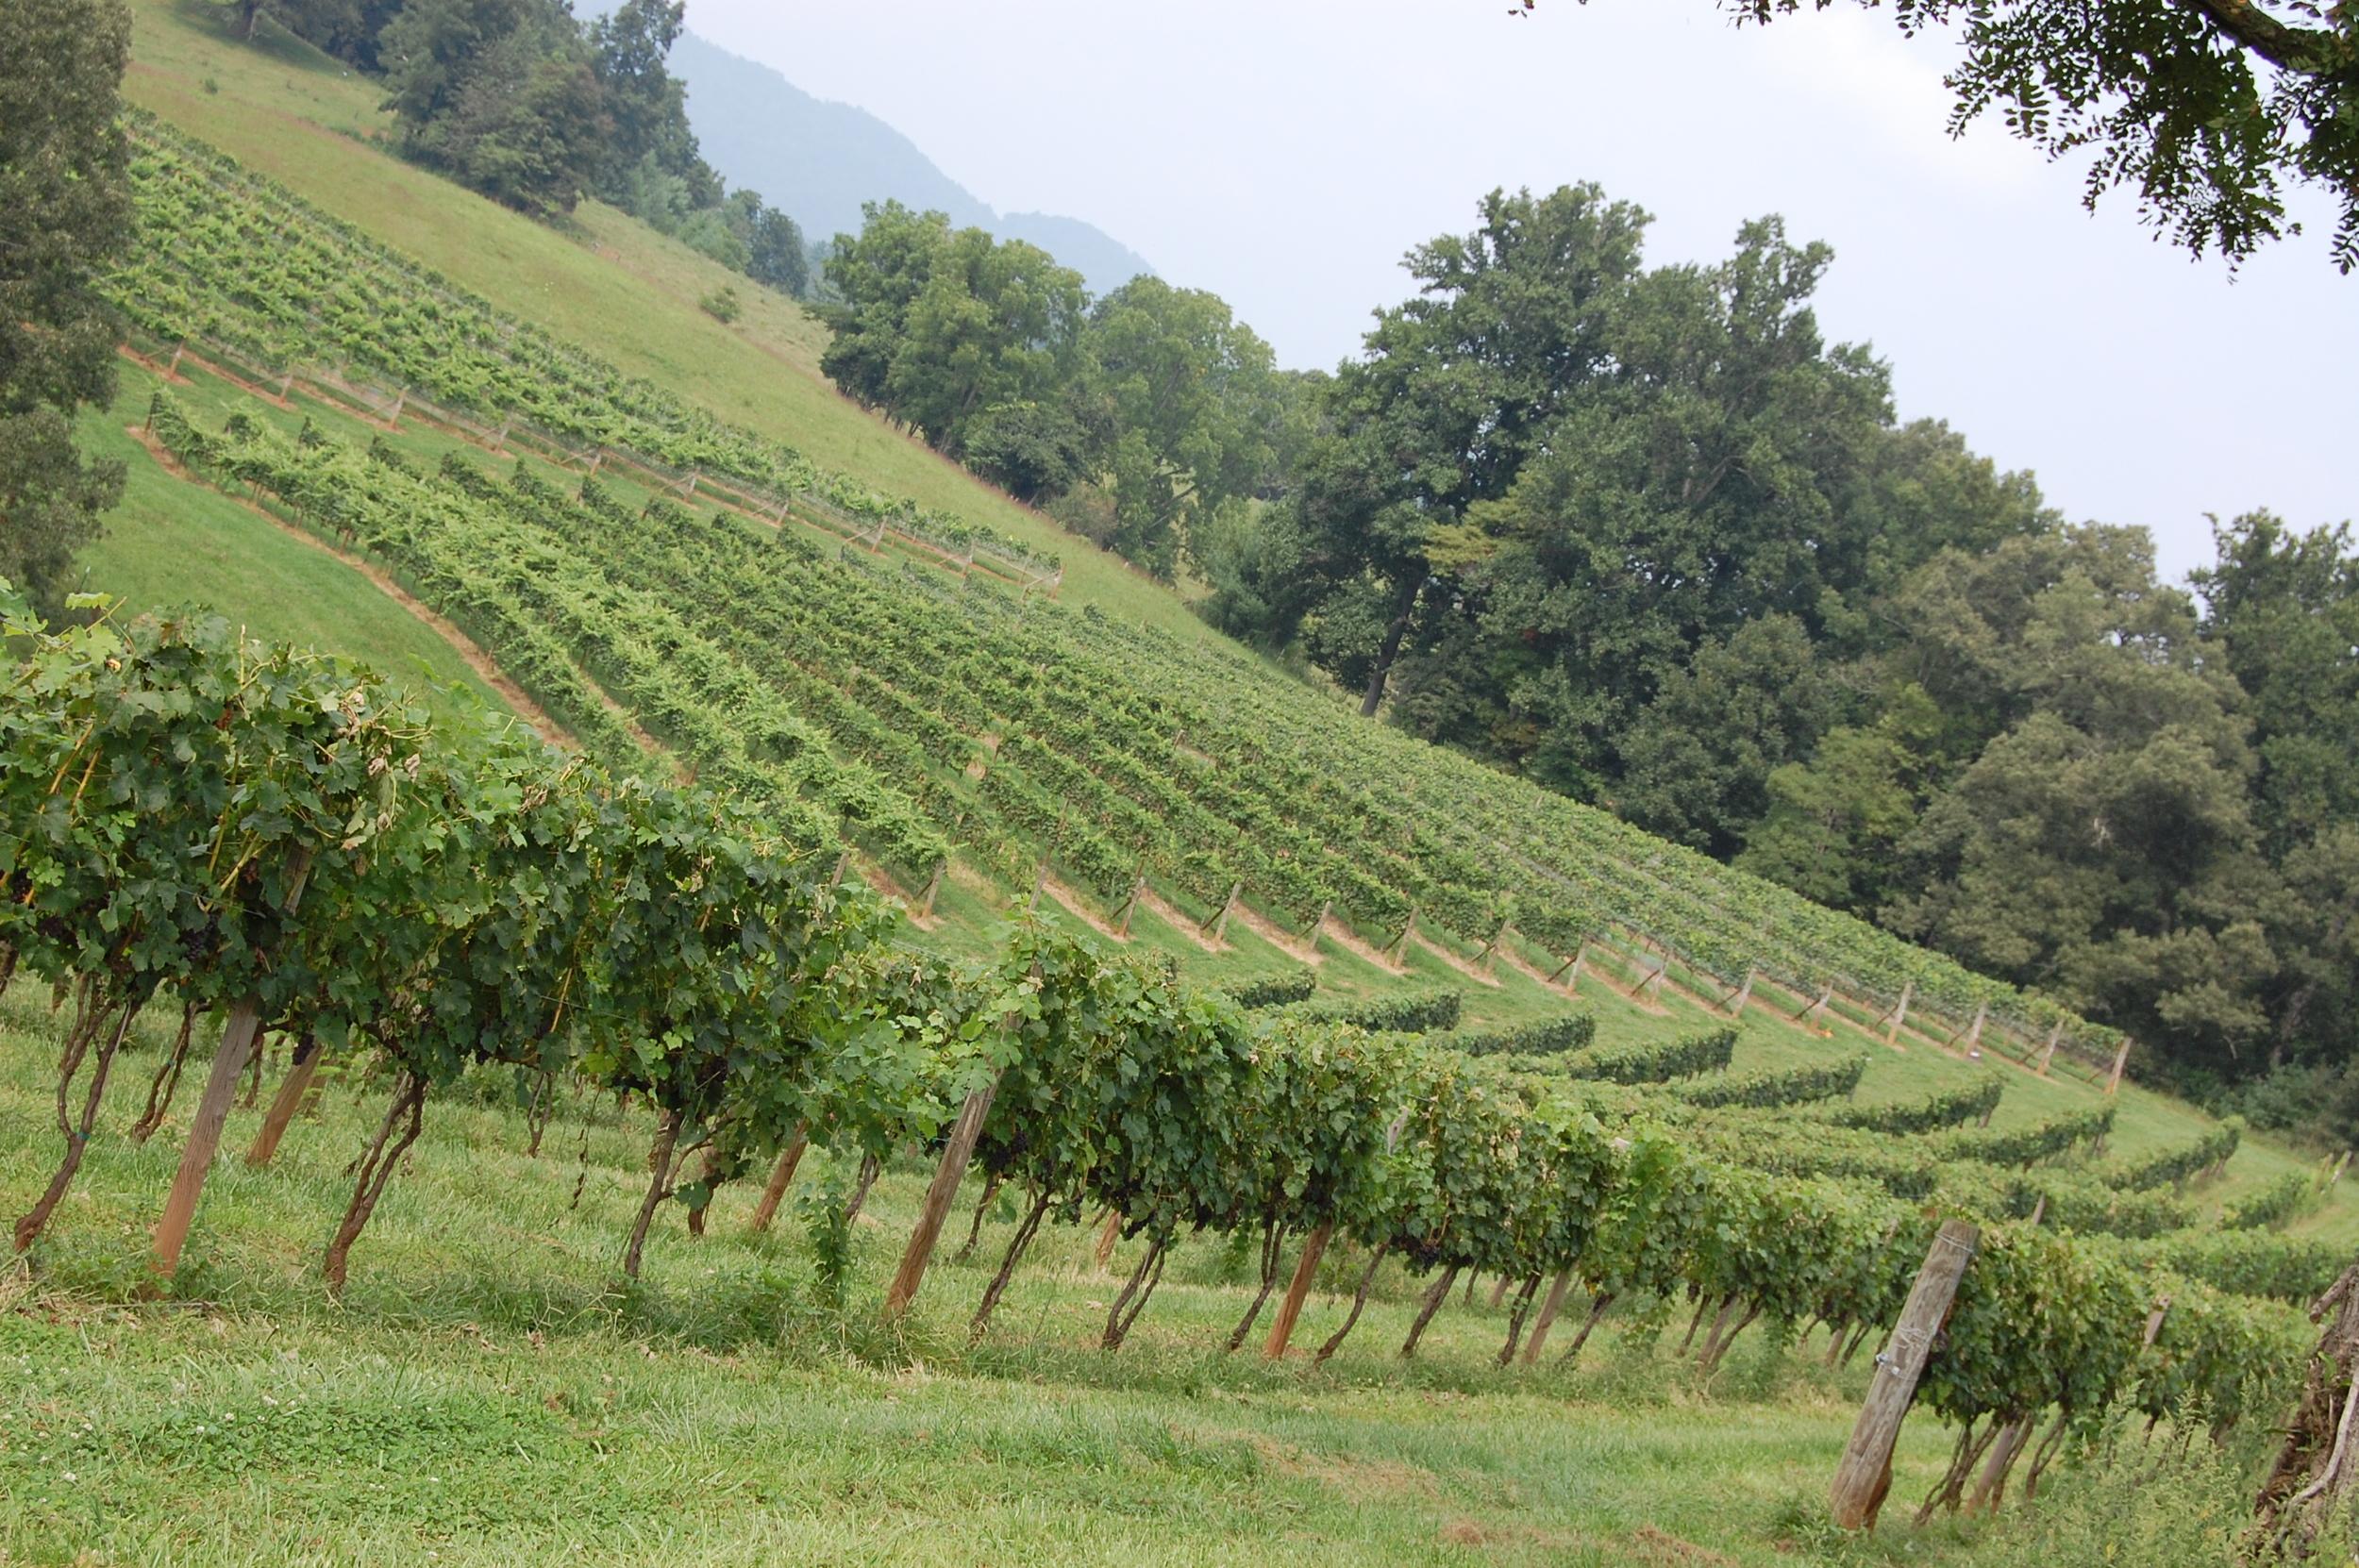 Addison Farms Vineyard 20 Aug 2013, mostly trim and proper.